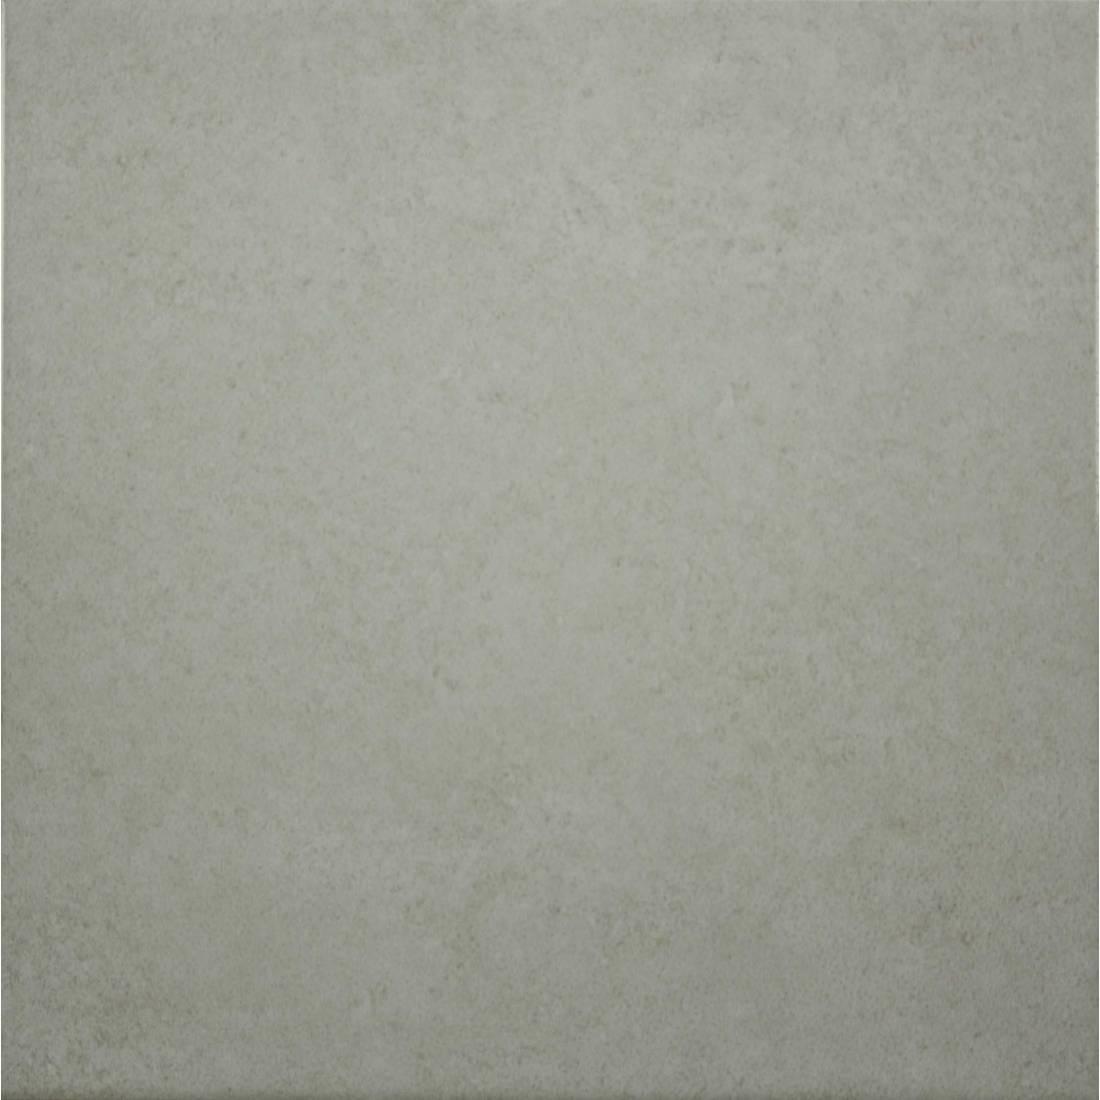 Artemis 25x25 Grey Gloss 1